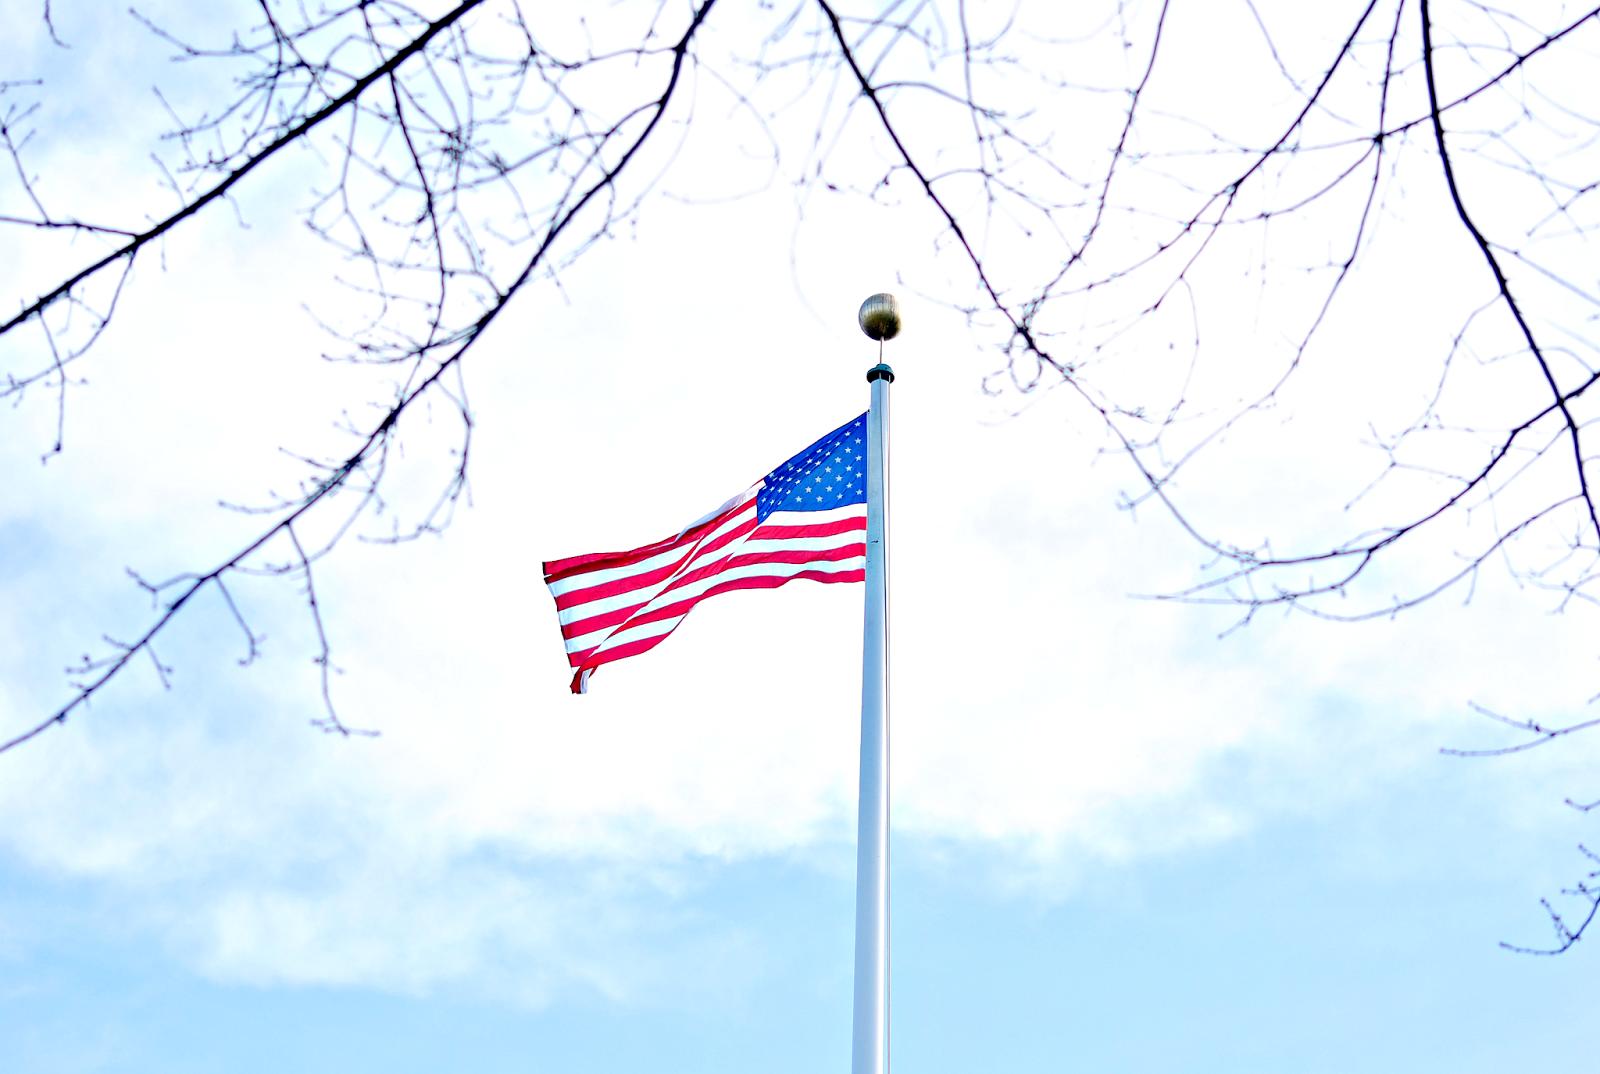 holandia, amerykańska flaga